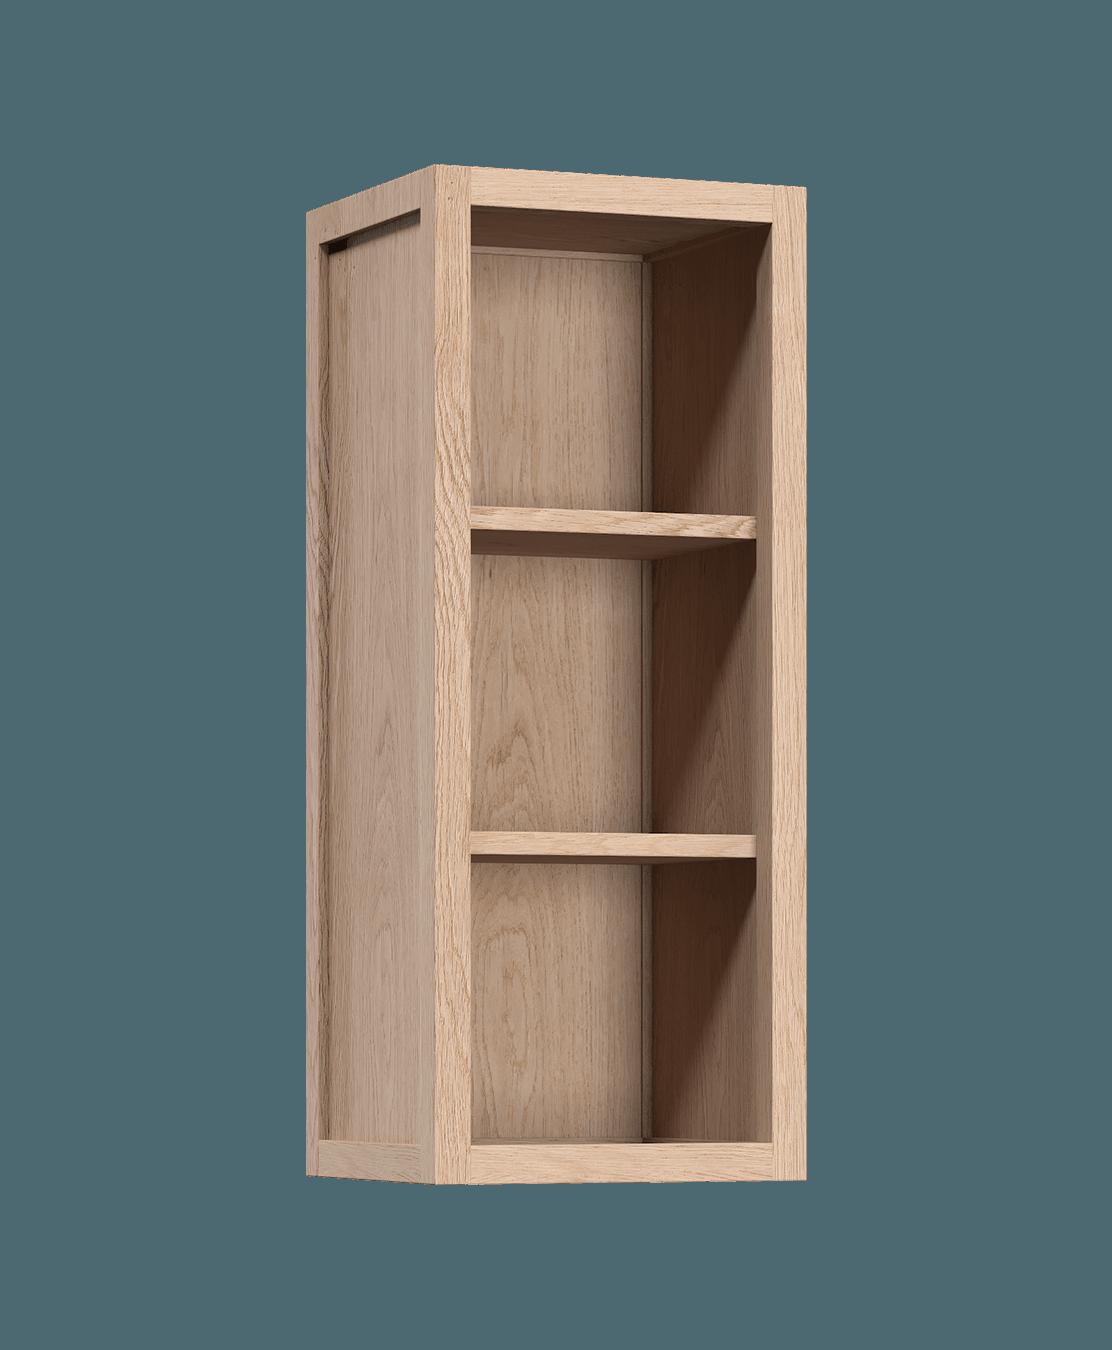 Radix Wall Upper Kitchen Cabinet Open 12 In White Oak Coquo